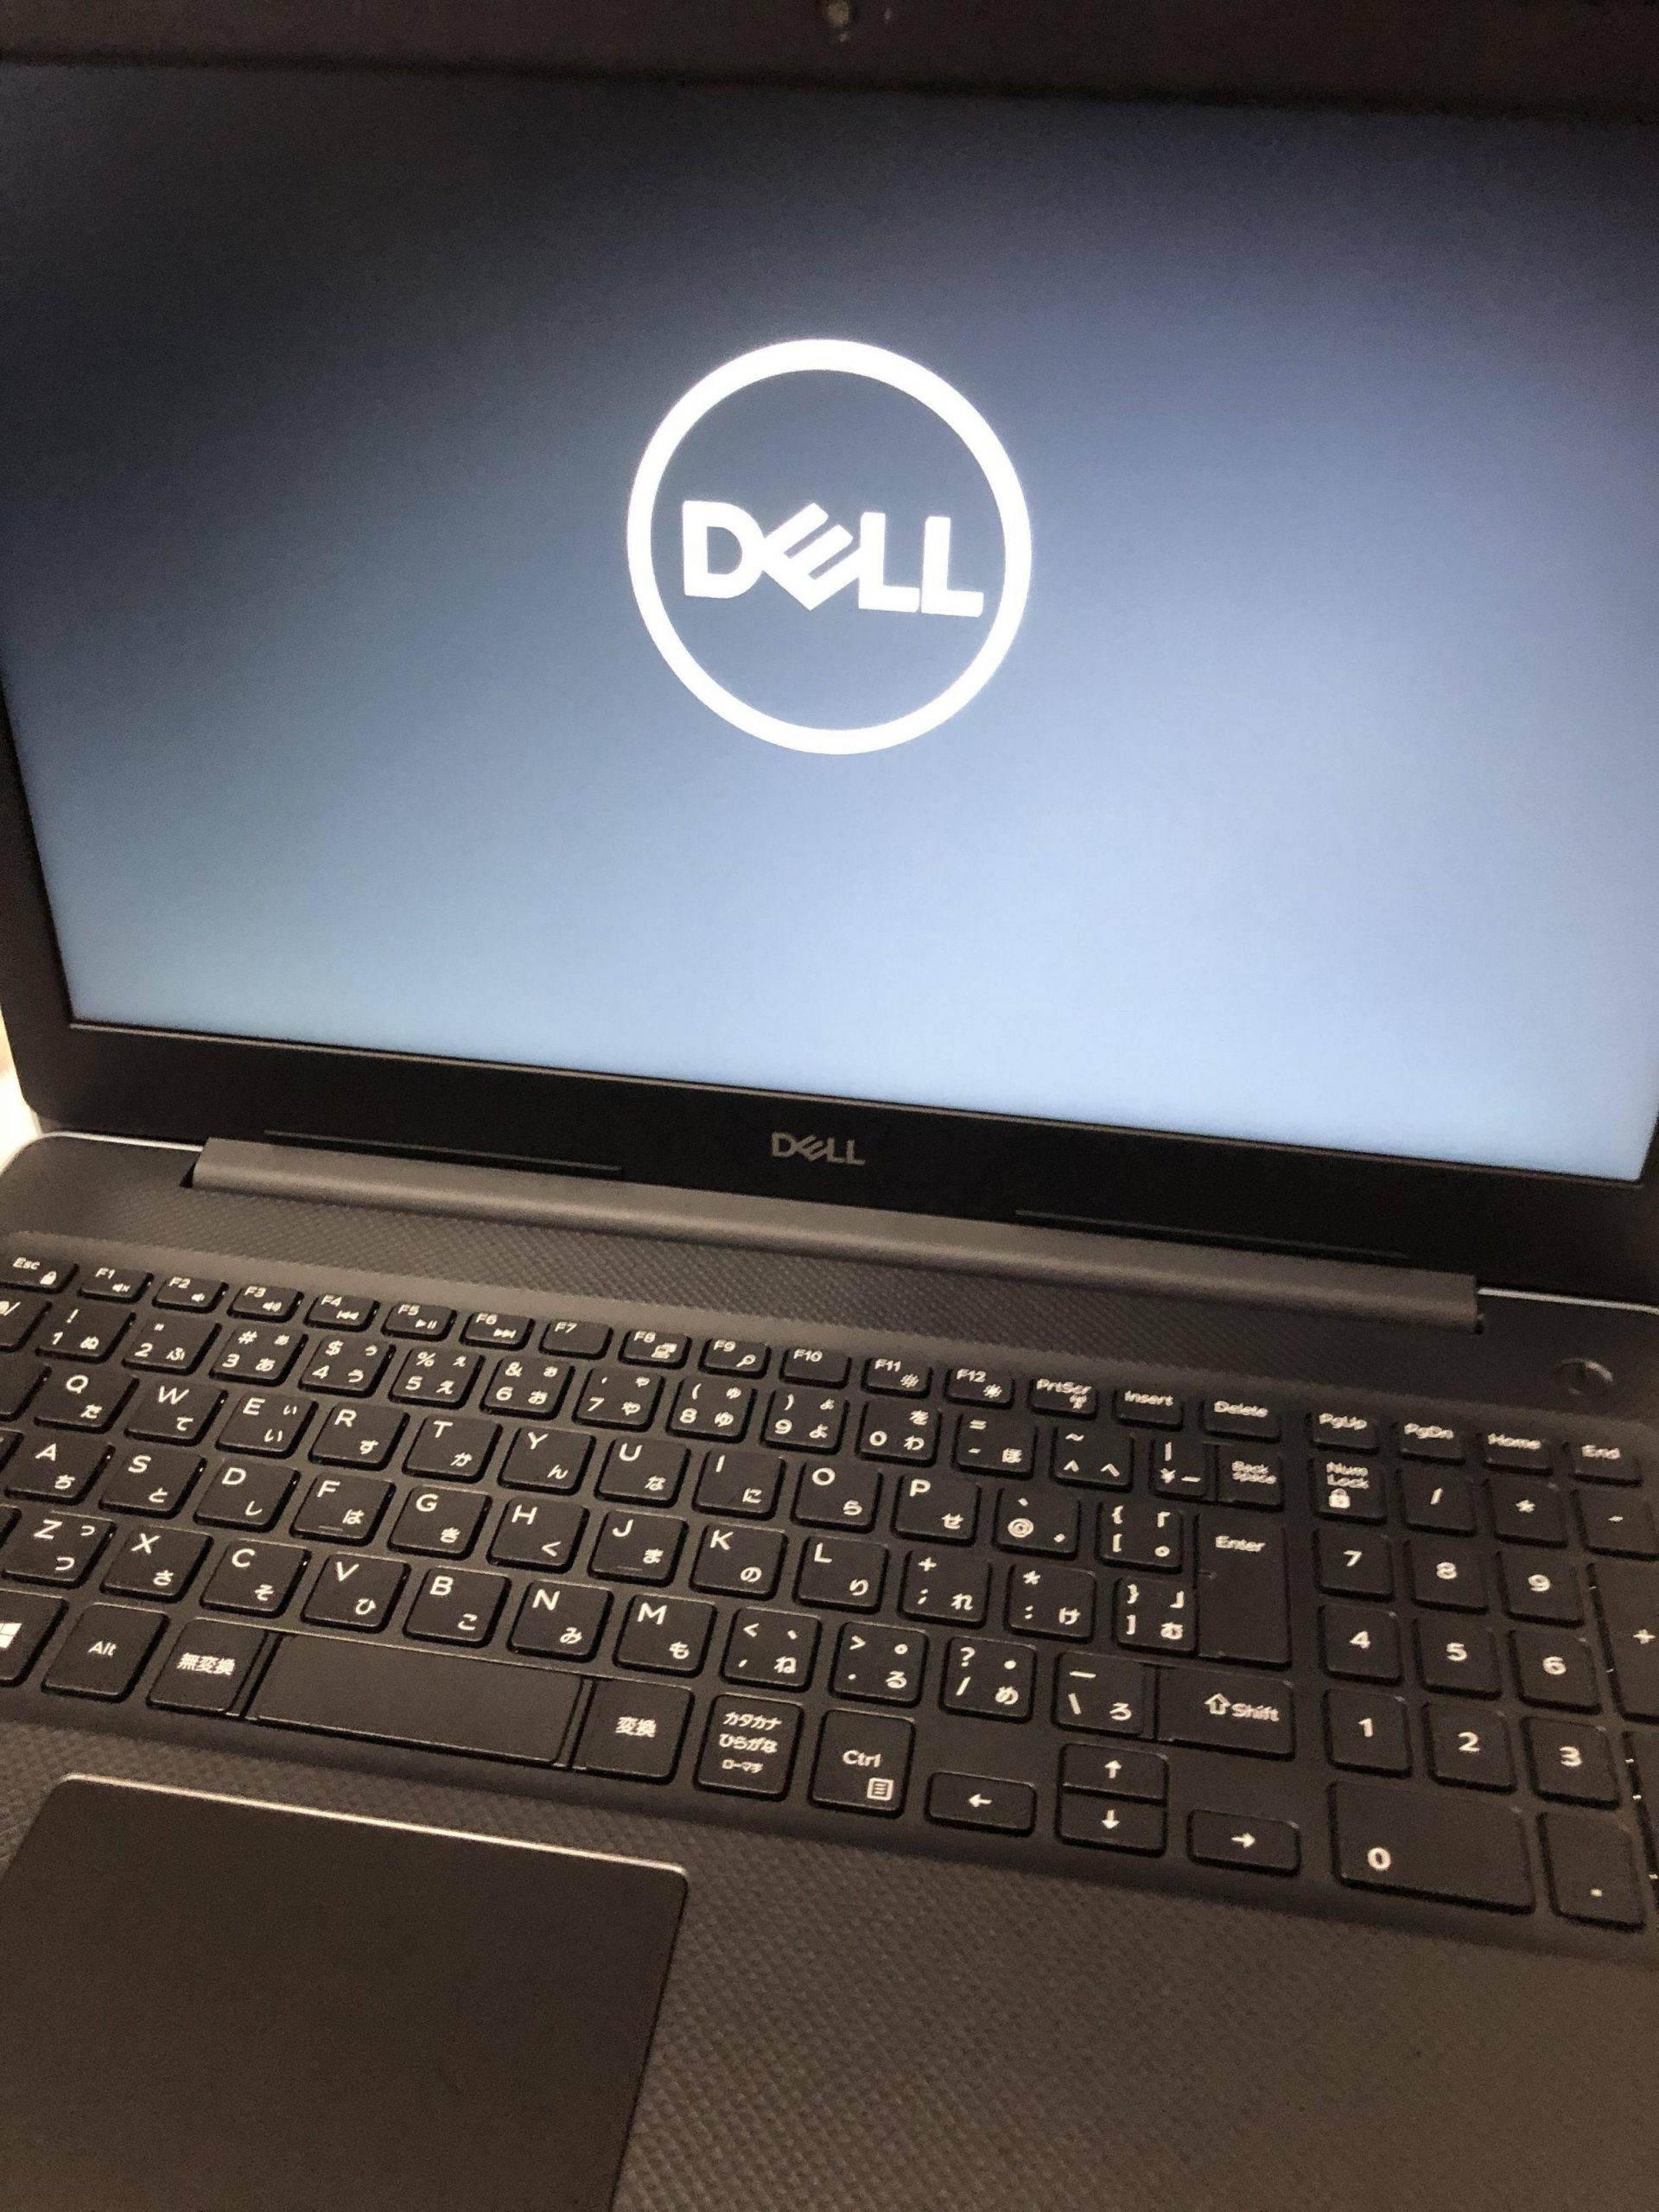 NJsBe9H scaled - 中国から買ったノートパソコン(55000円)届いたンゴ